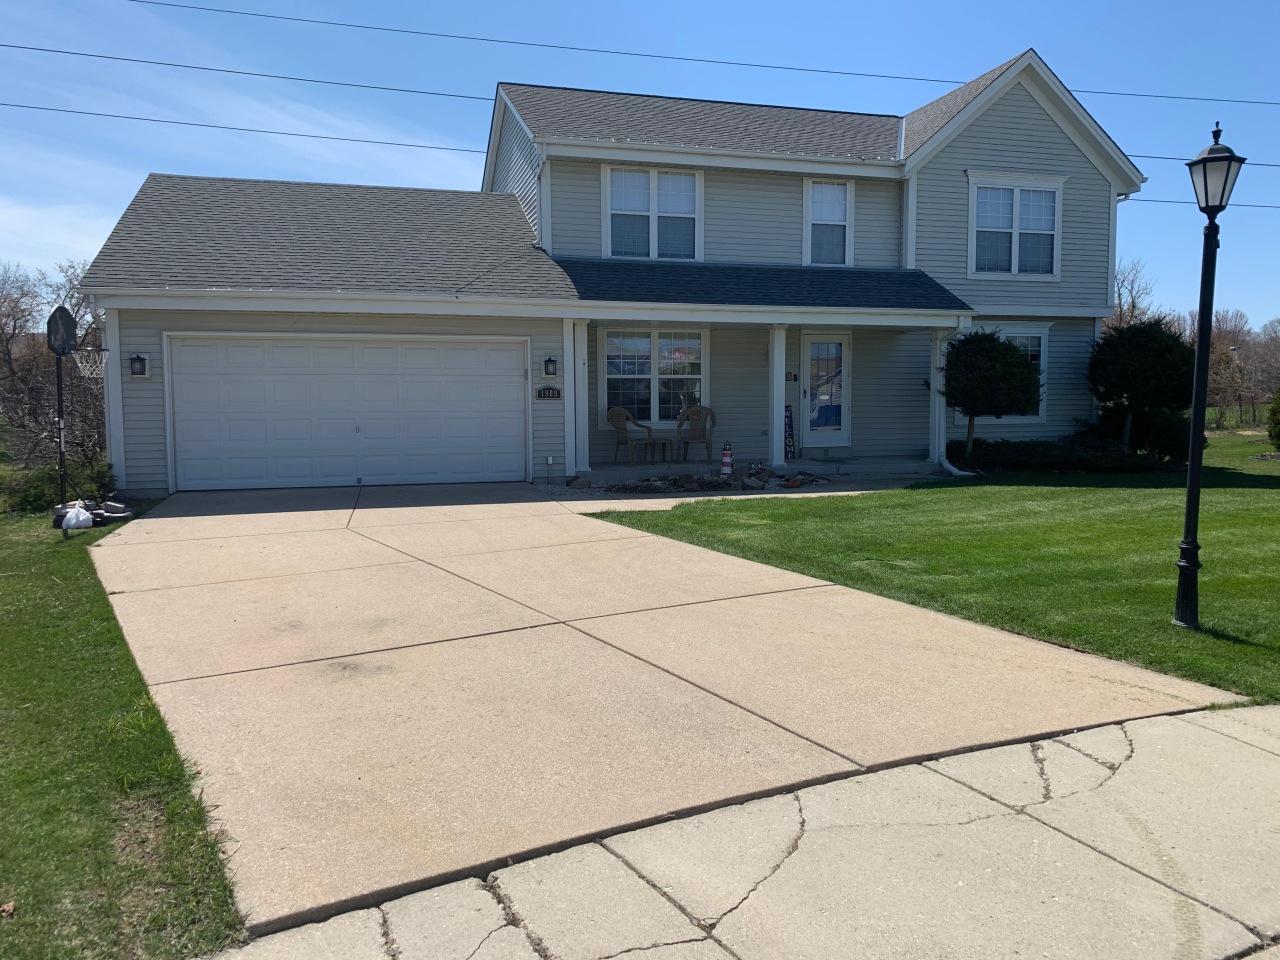 1909 Crossbow Ct, Waukesha, Wisconsin 53186, 3 Bedrooms Bedrooms, ,2 BathroomsBathrooms,Single-Family,For Sale,Crossbow Ct,1686465